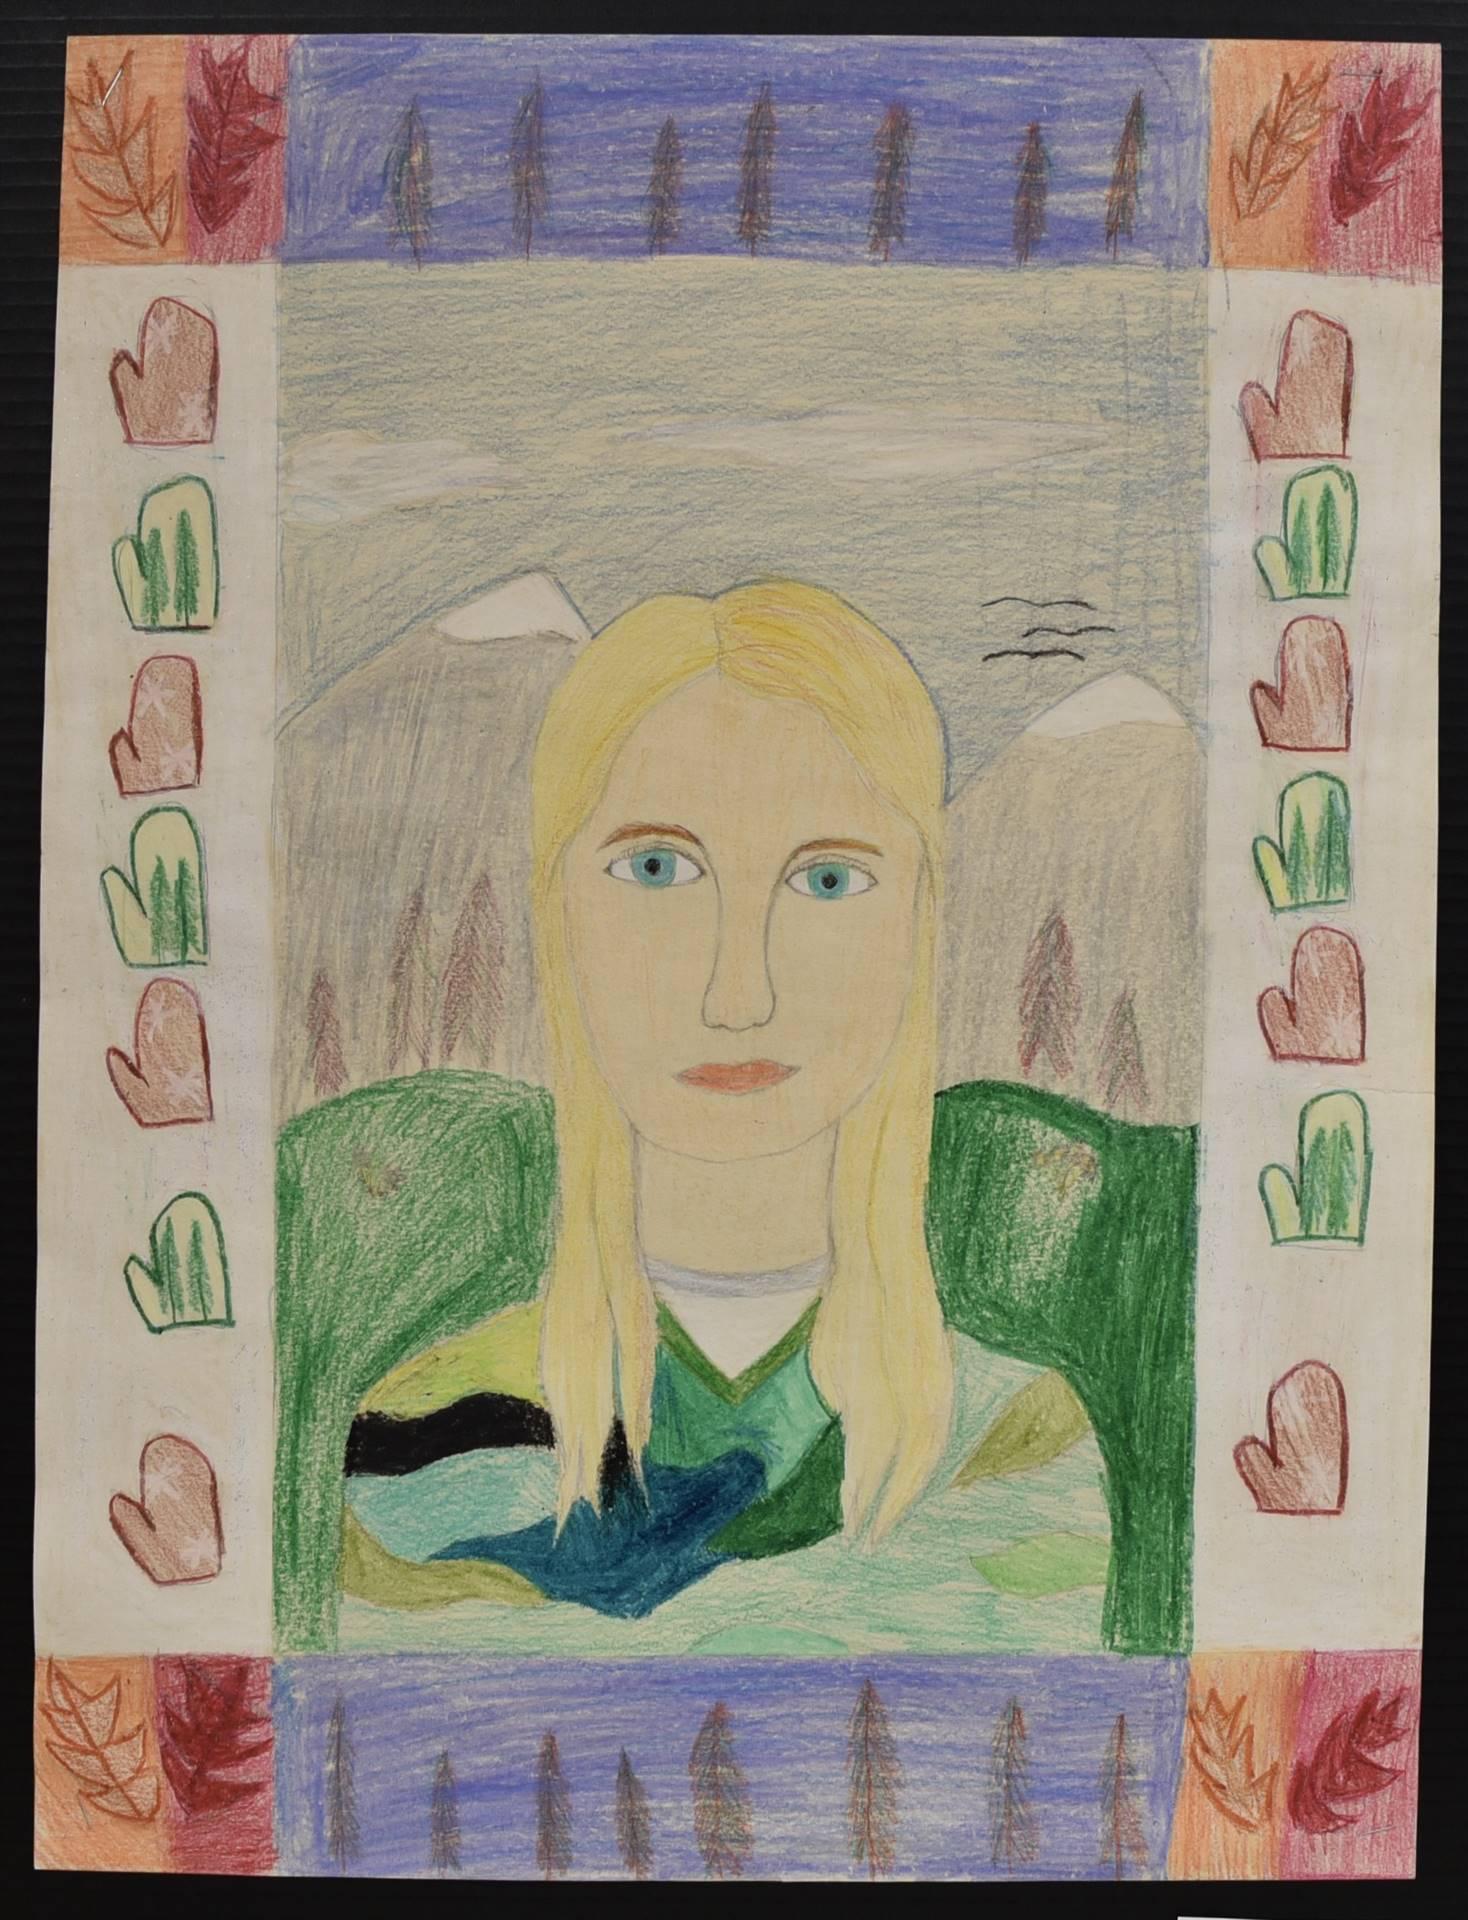 Brecksville-Broadview Hts. Middle School Art Projects 152